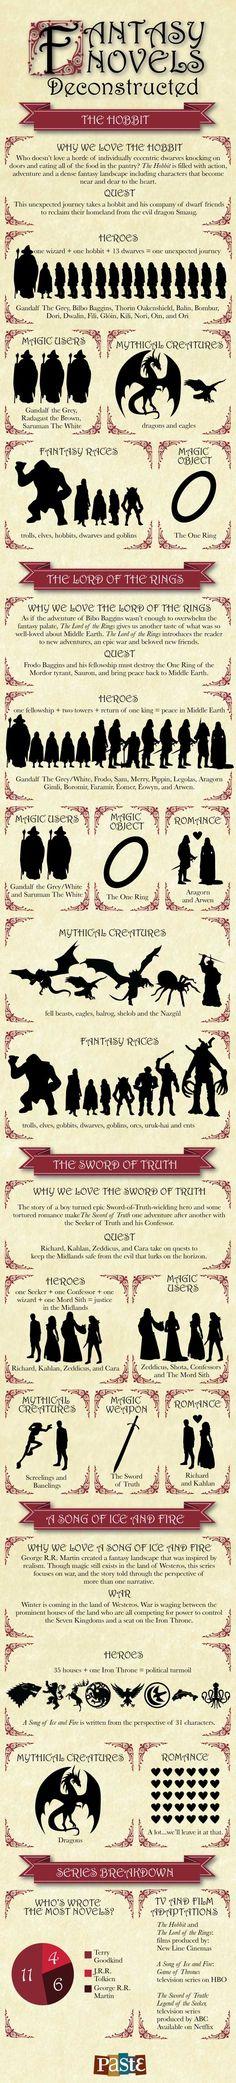 FantasyNovelsDeconstructed